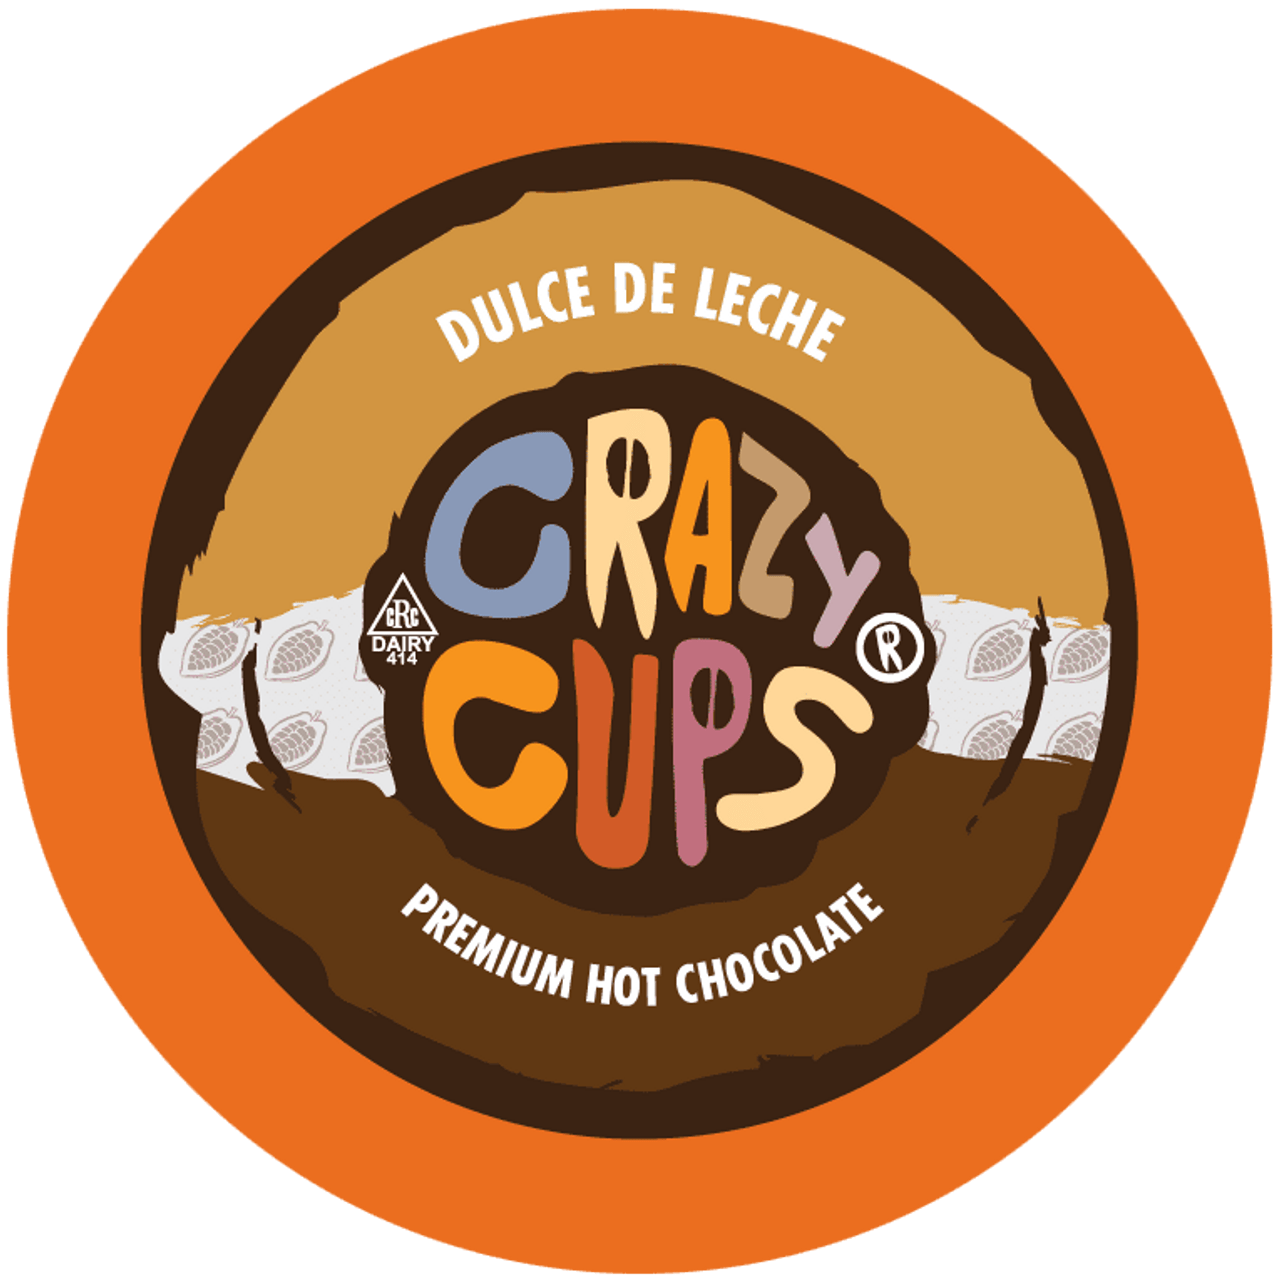 Dulce de Leche Hot Chocolate by Crazy Cups